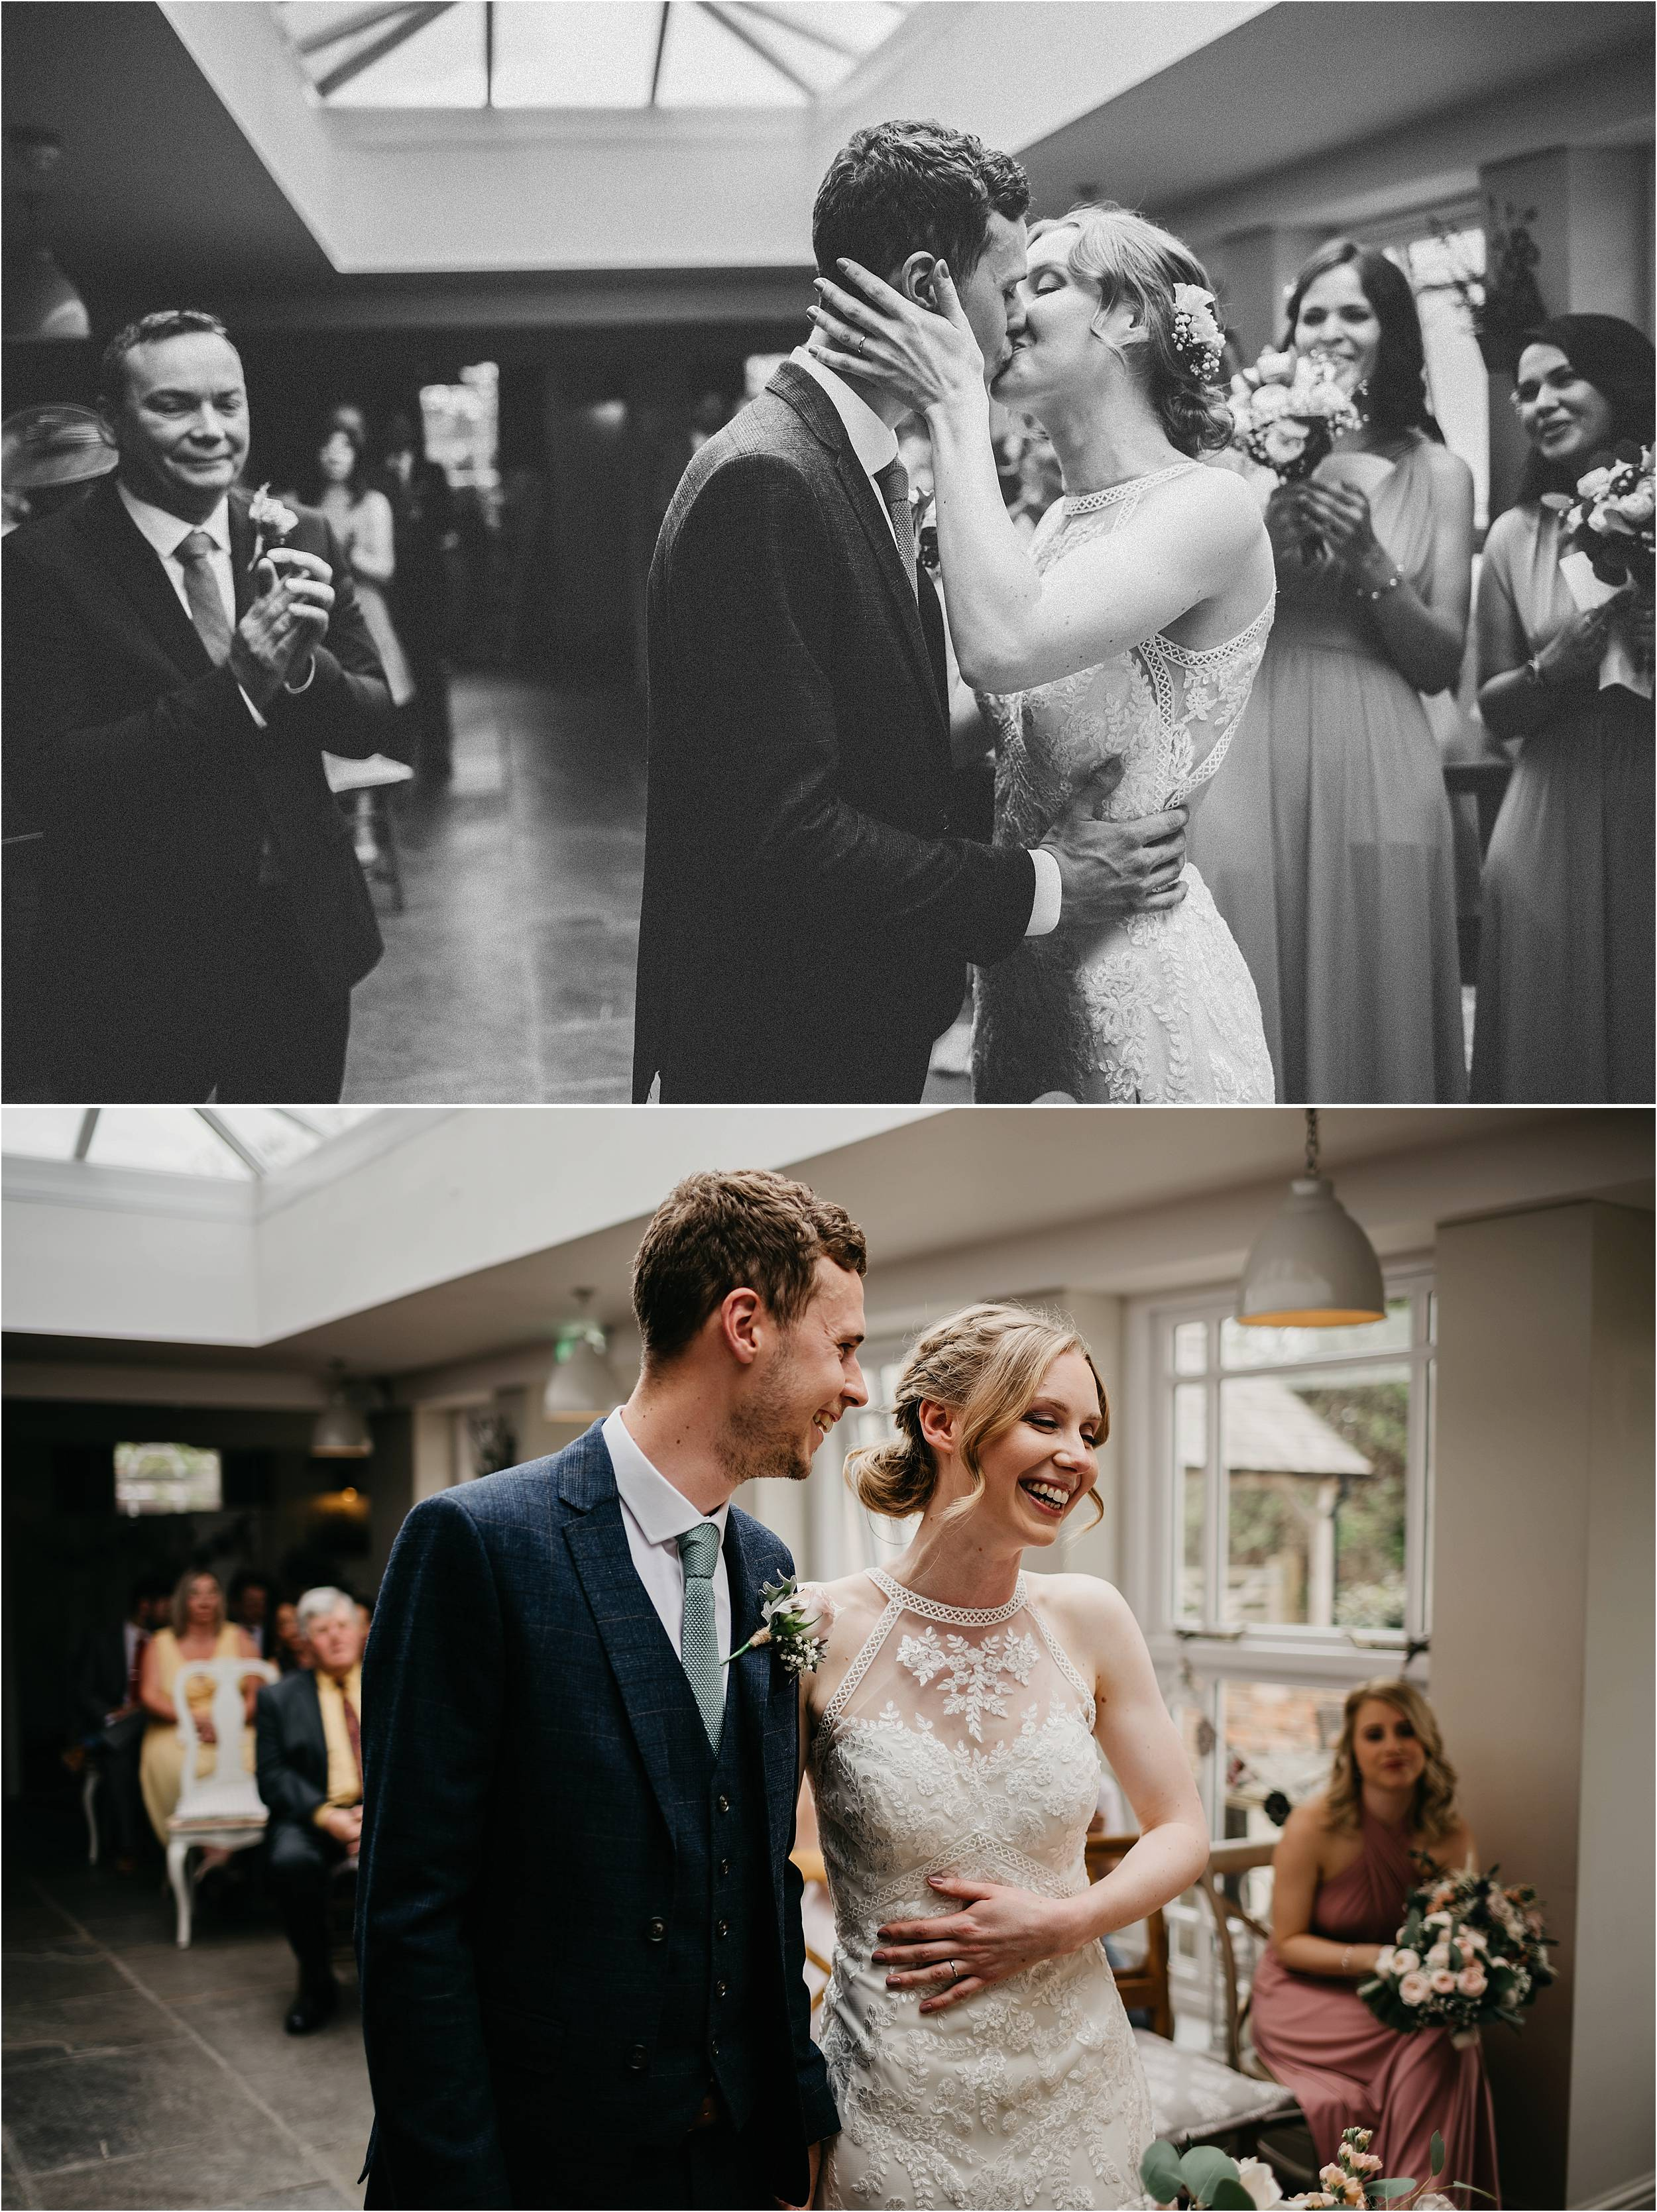 Kedleston Country House Wedding Photography_0050.jpg